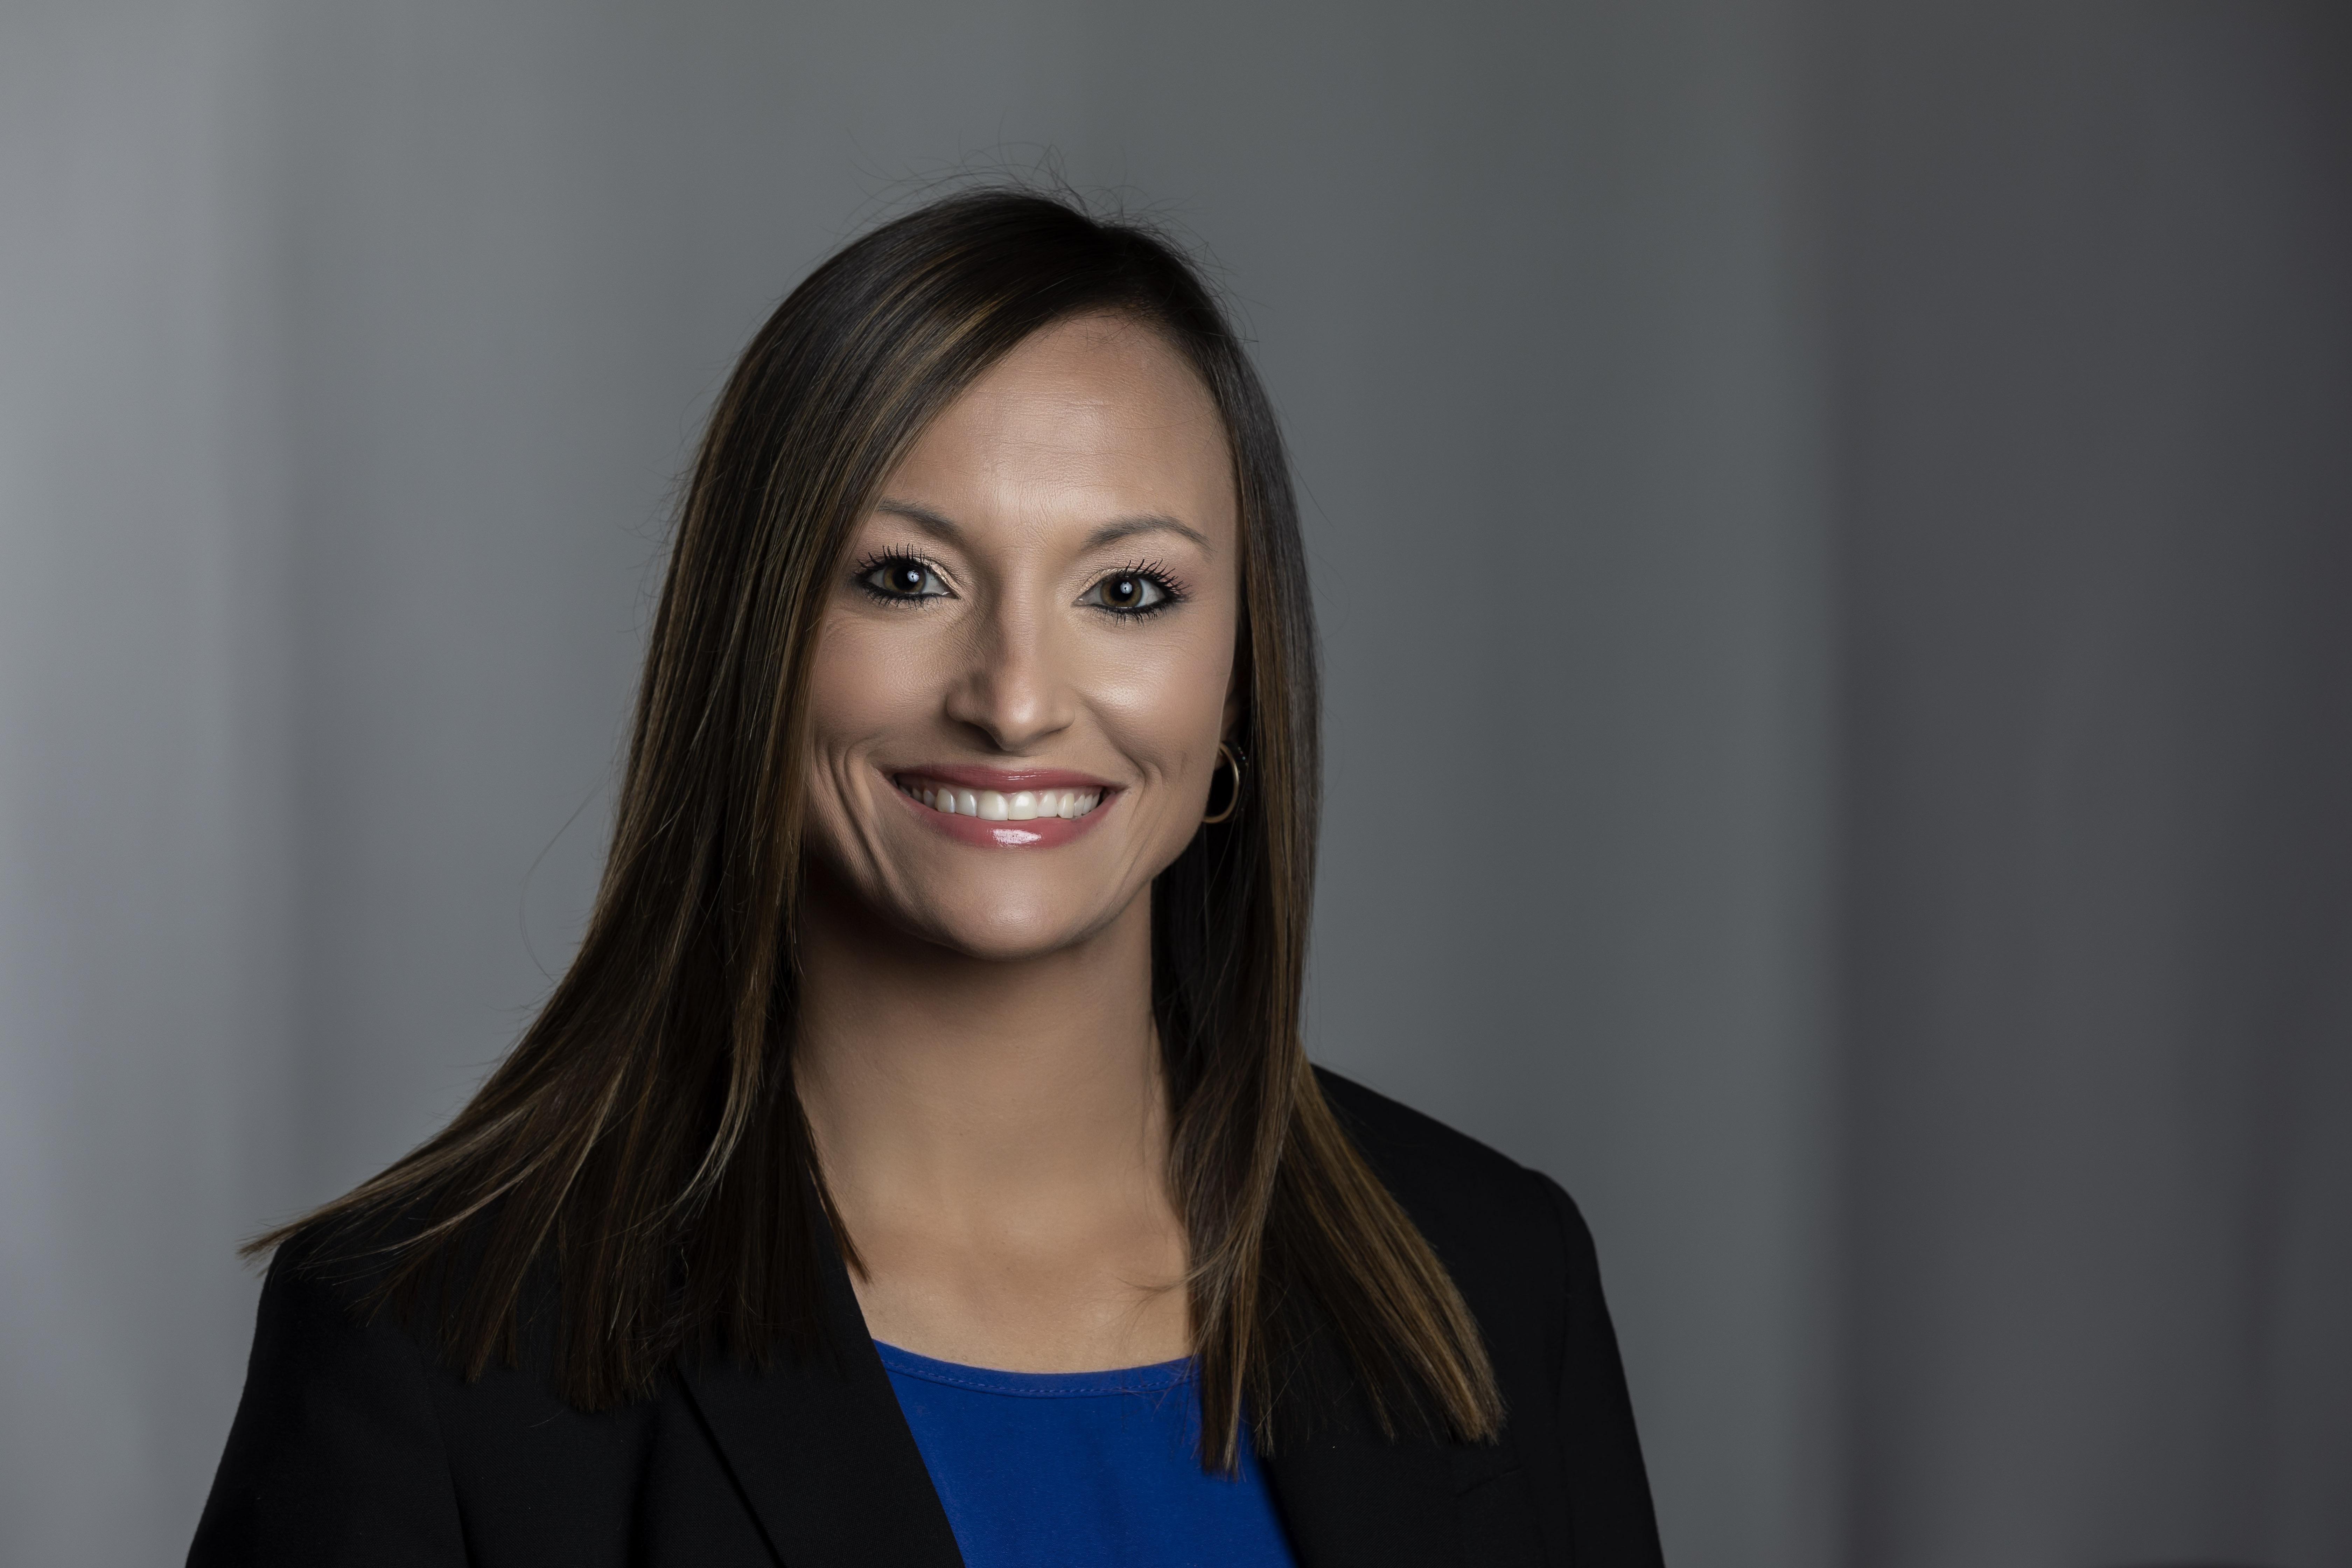 Chevron Phillips Chemical's Amanda Baca earns 2021 STEP Ahead award